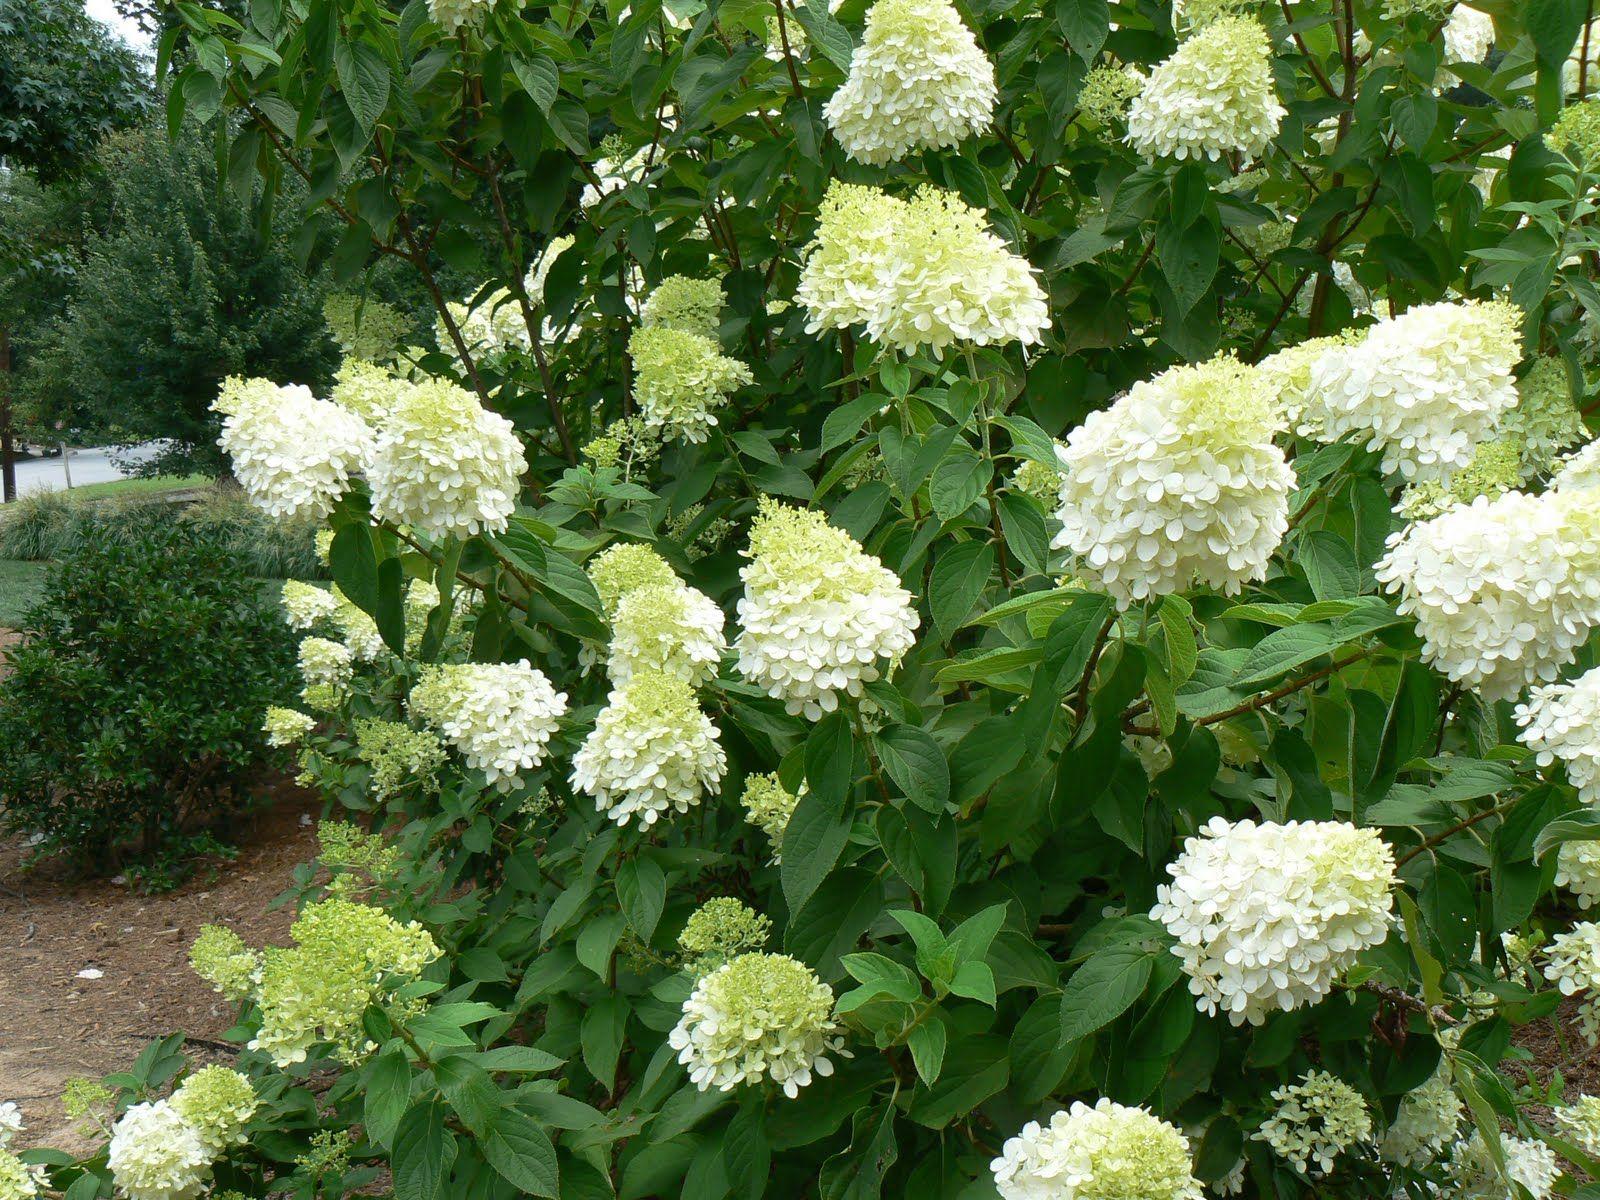 casagiardino limelight hydrangeas troshortensia 5 garden of earthly delights pinterest. Black Bedroom Furniture Sets. Home Design Ideas